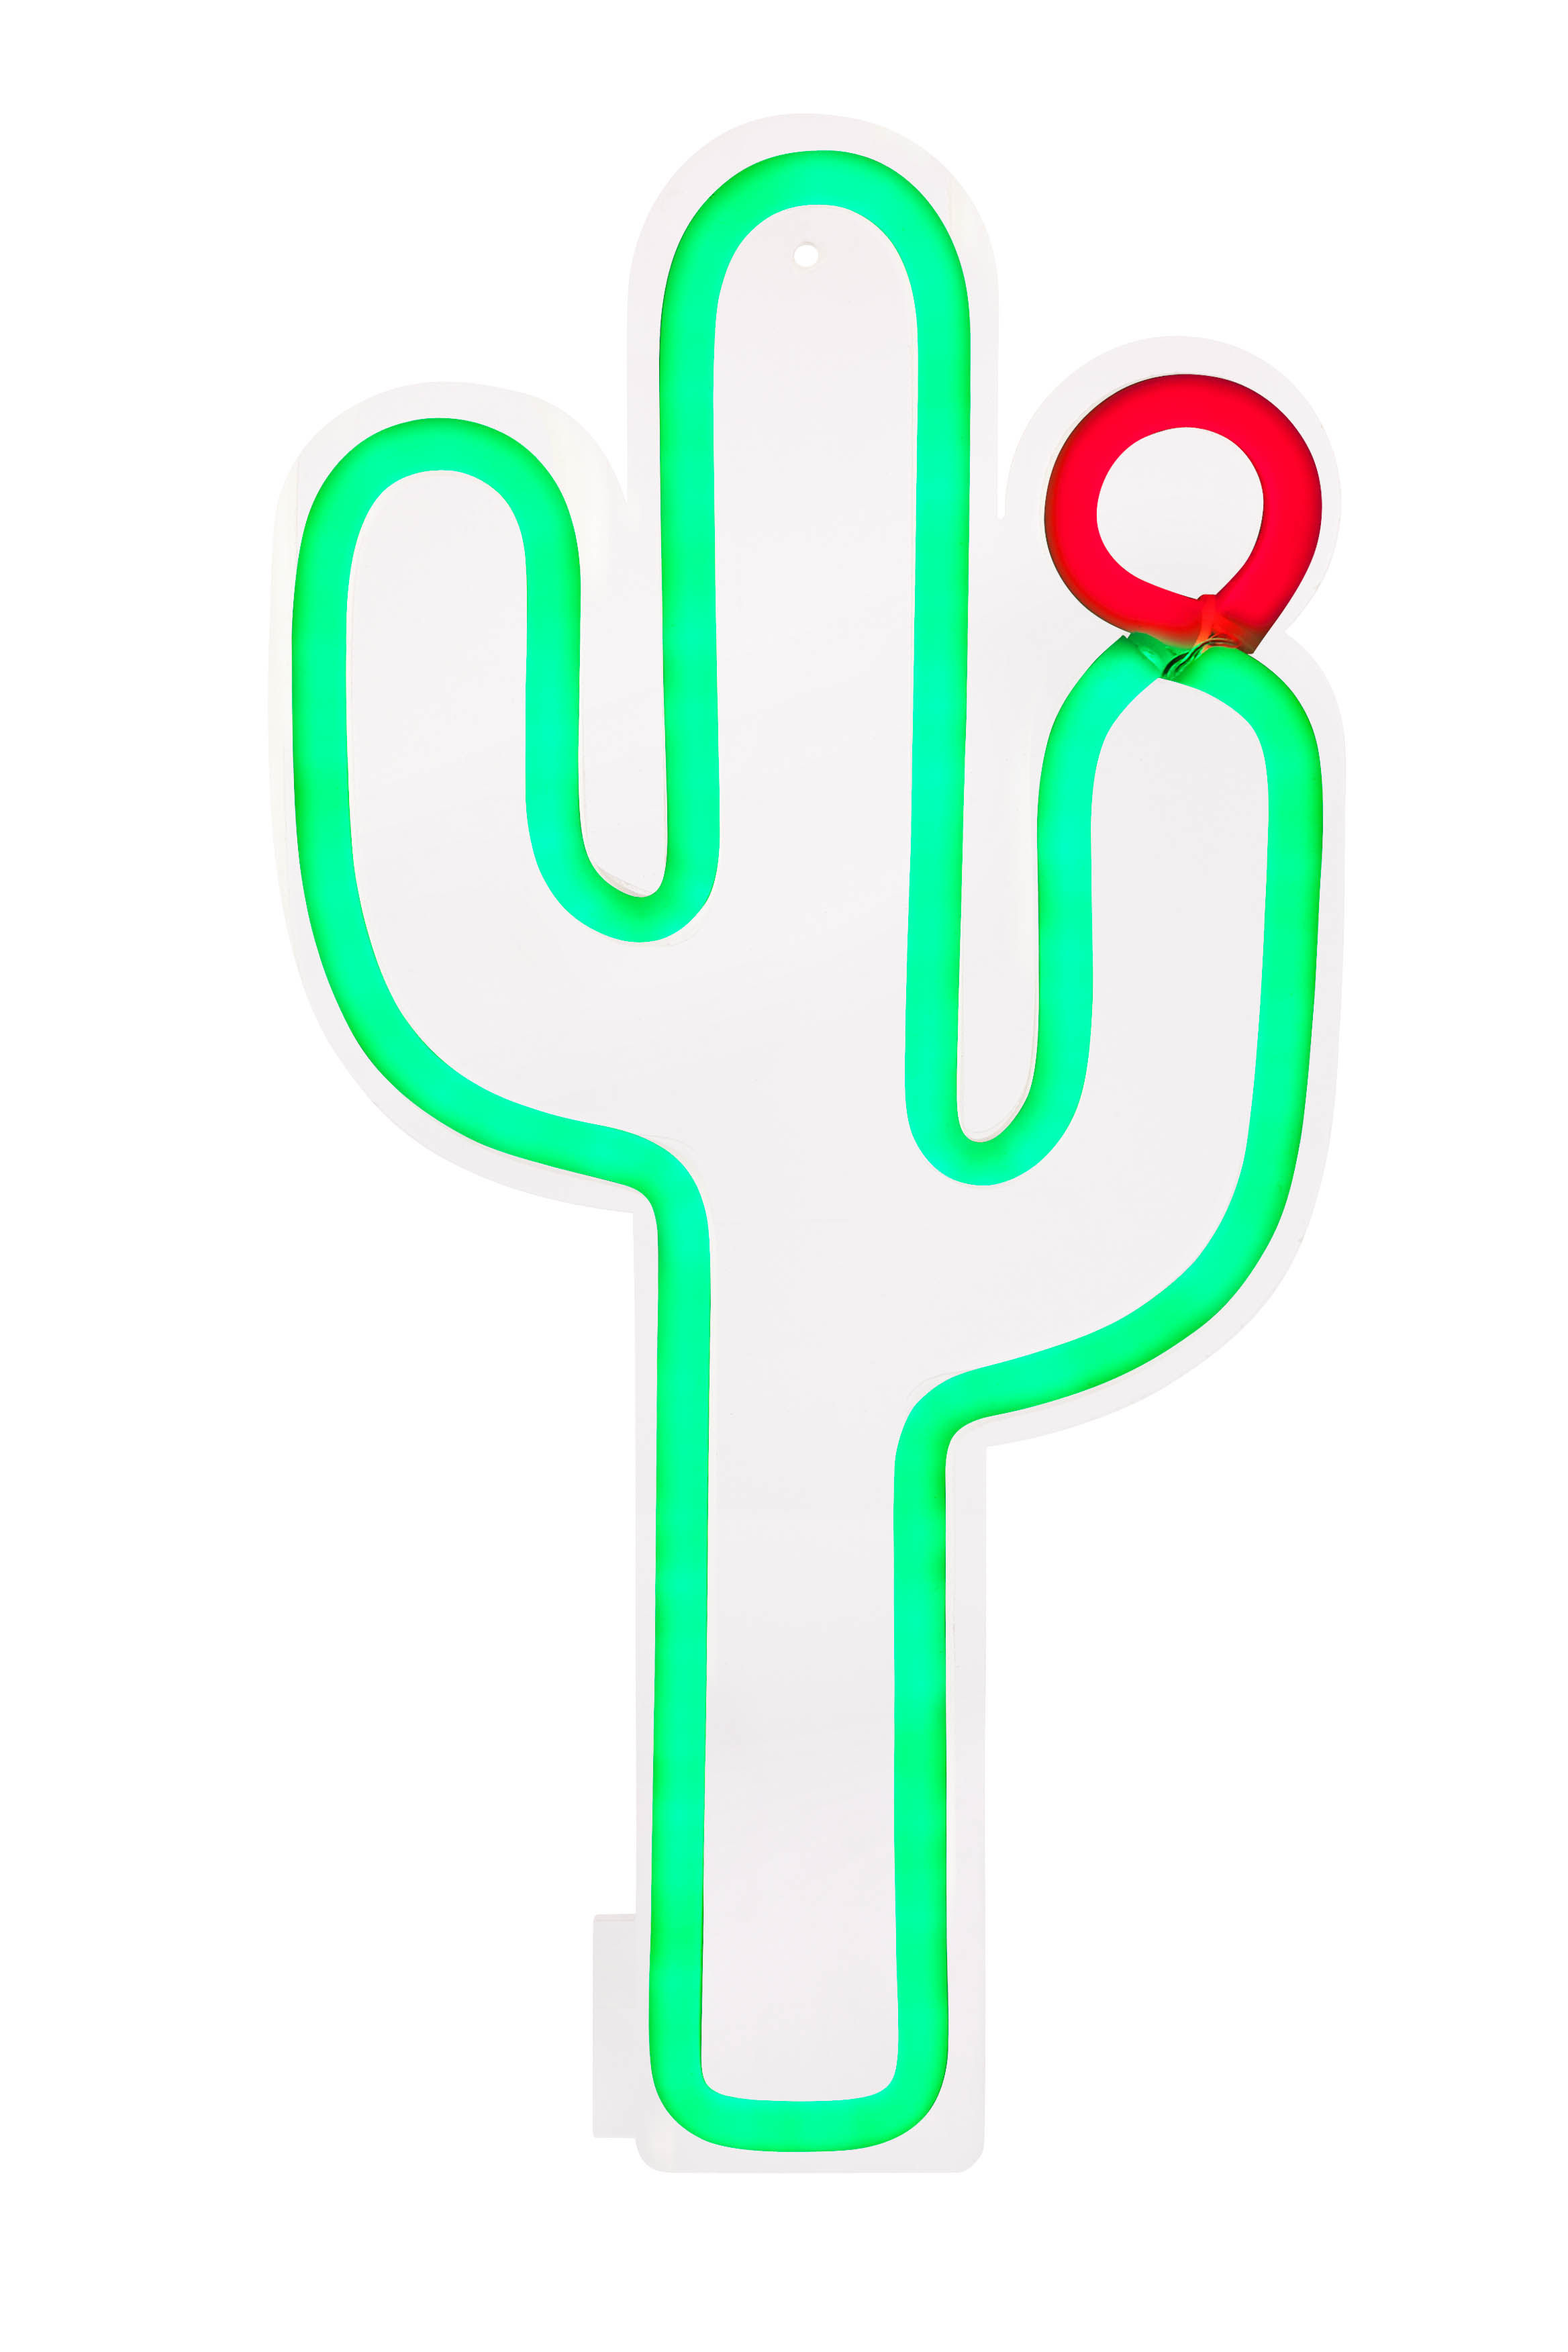 Dekoration - Für Kinder - Neon Cactus Large Wandleuchte mit Stromkabel / LED - H 60 cm - Sunnylife - Kaktus - Glas, Plastique acrylique